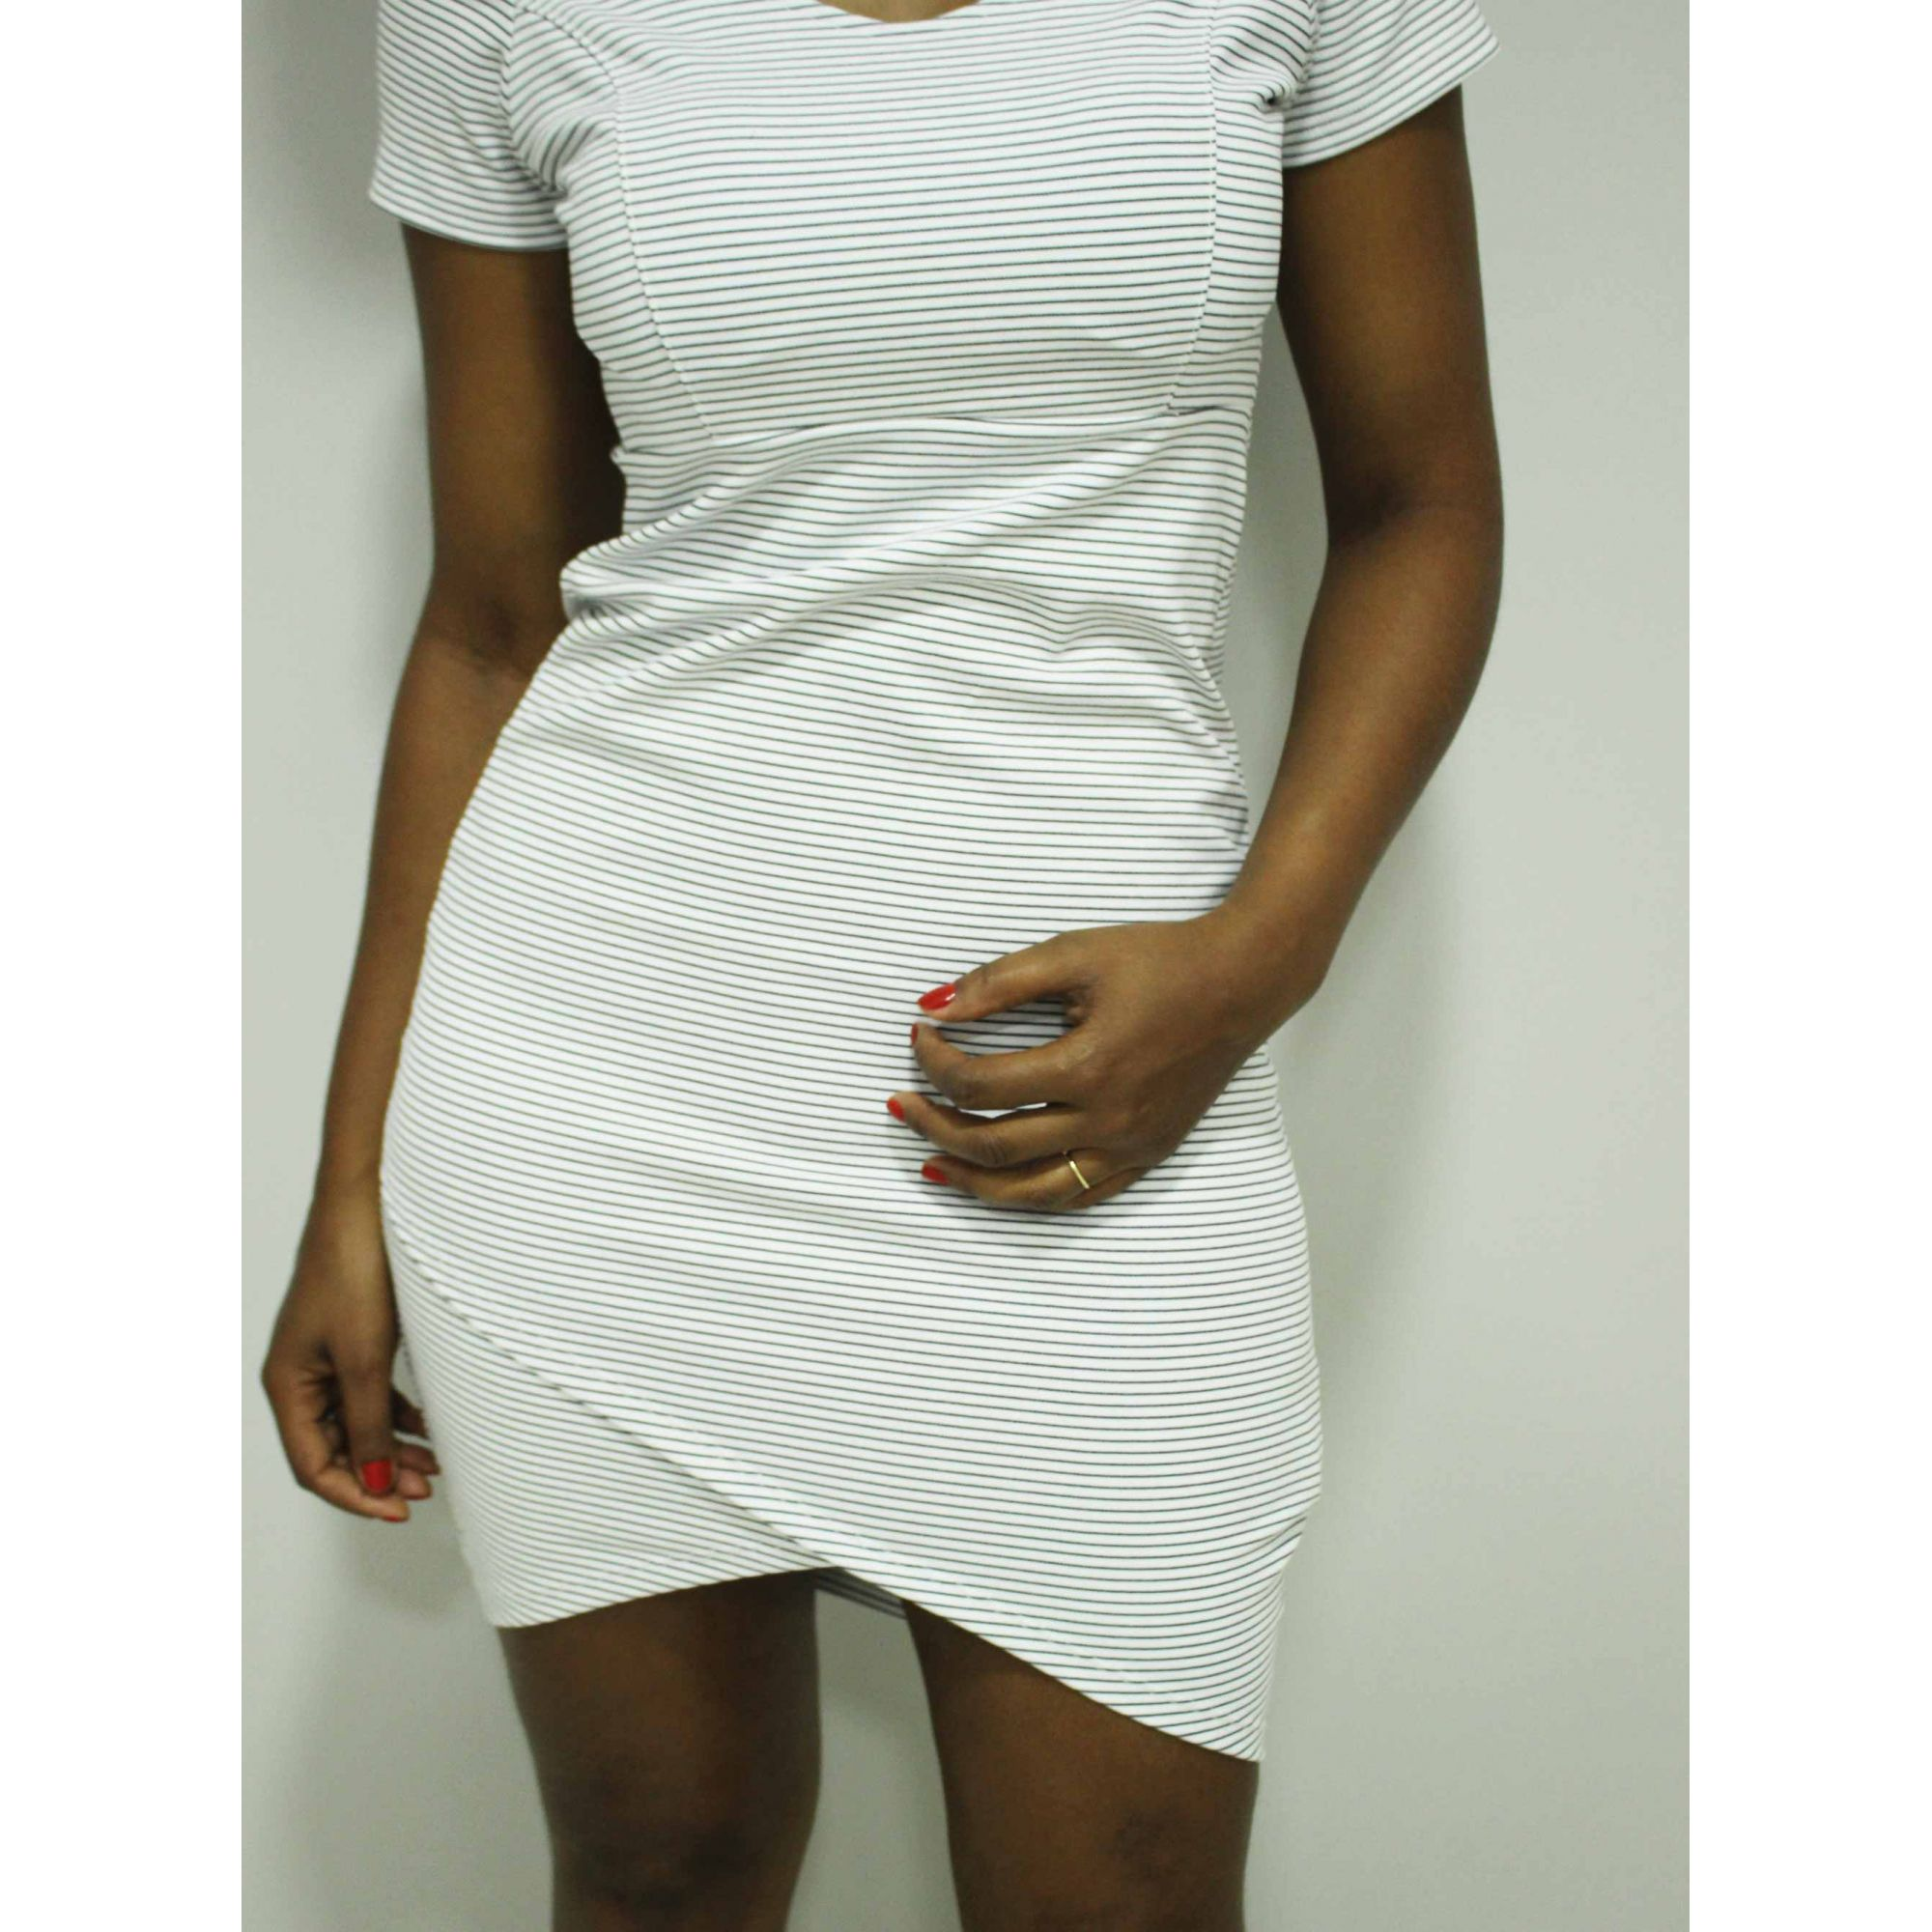 Vestido Tubinho Parado no Ar Listrado Branco  - Pick Tita